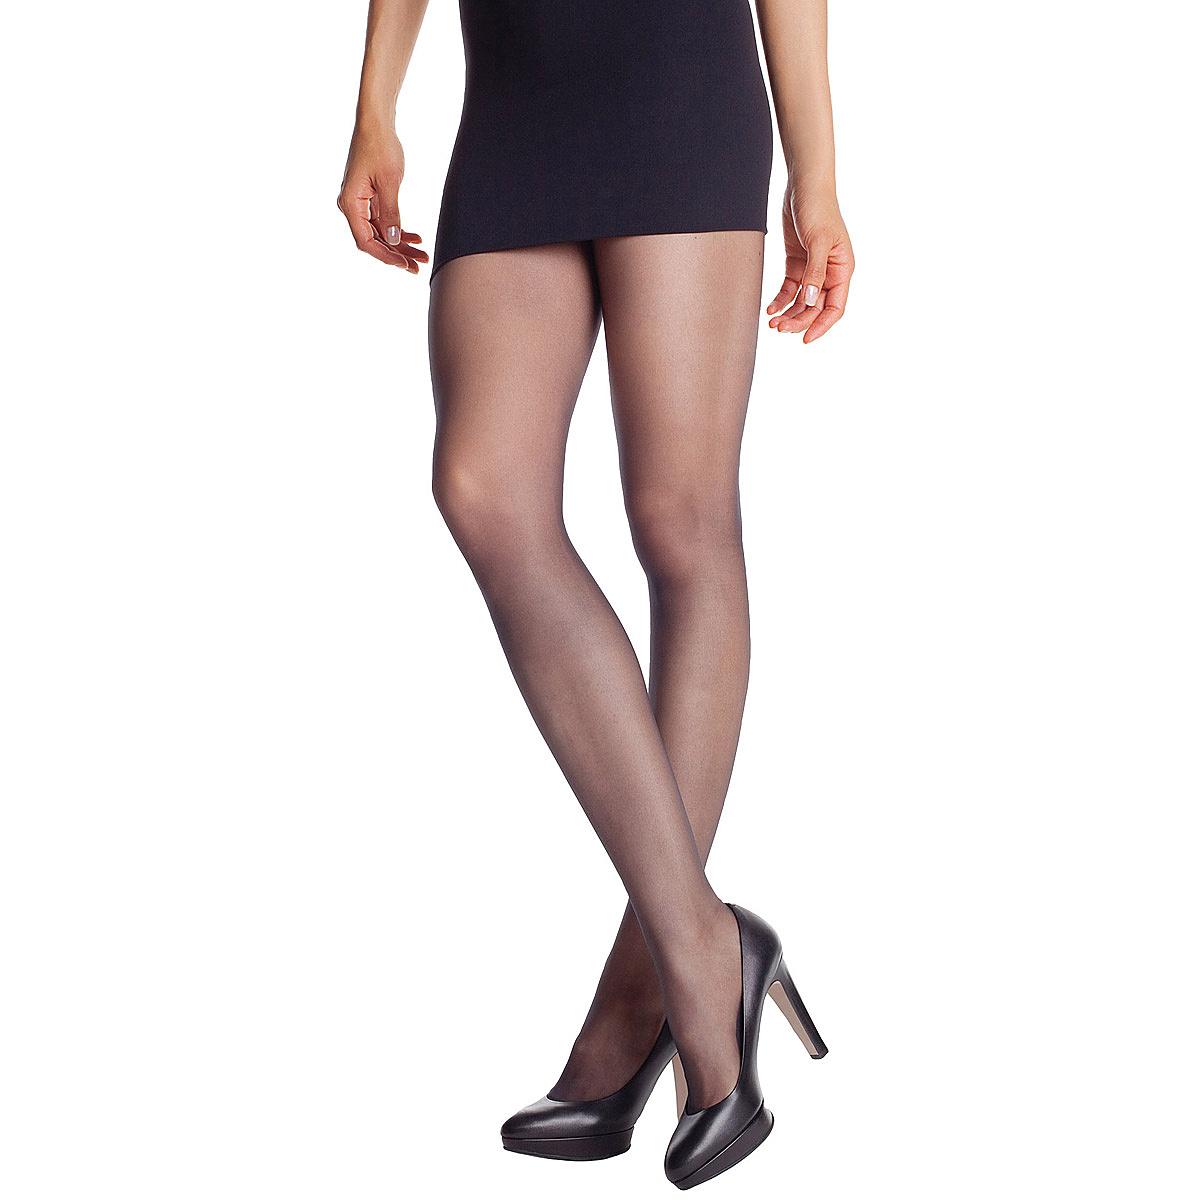 5356a99c5 Black Diam s Jambes Fuselées 25 leg shaper tights